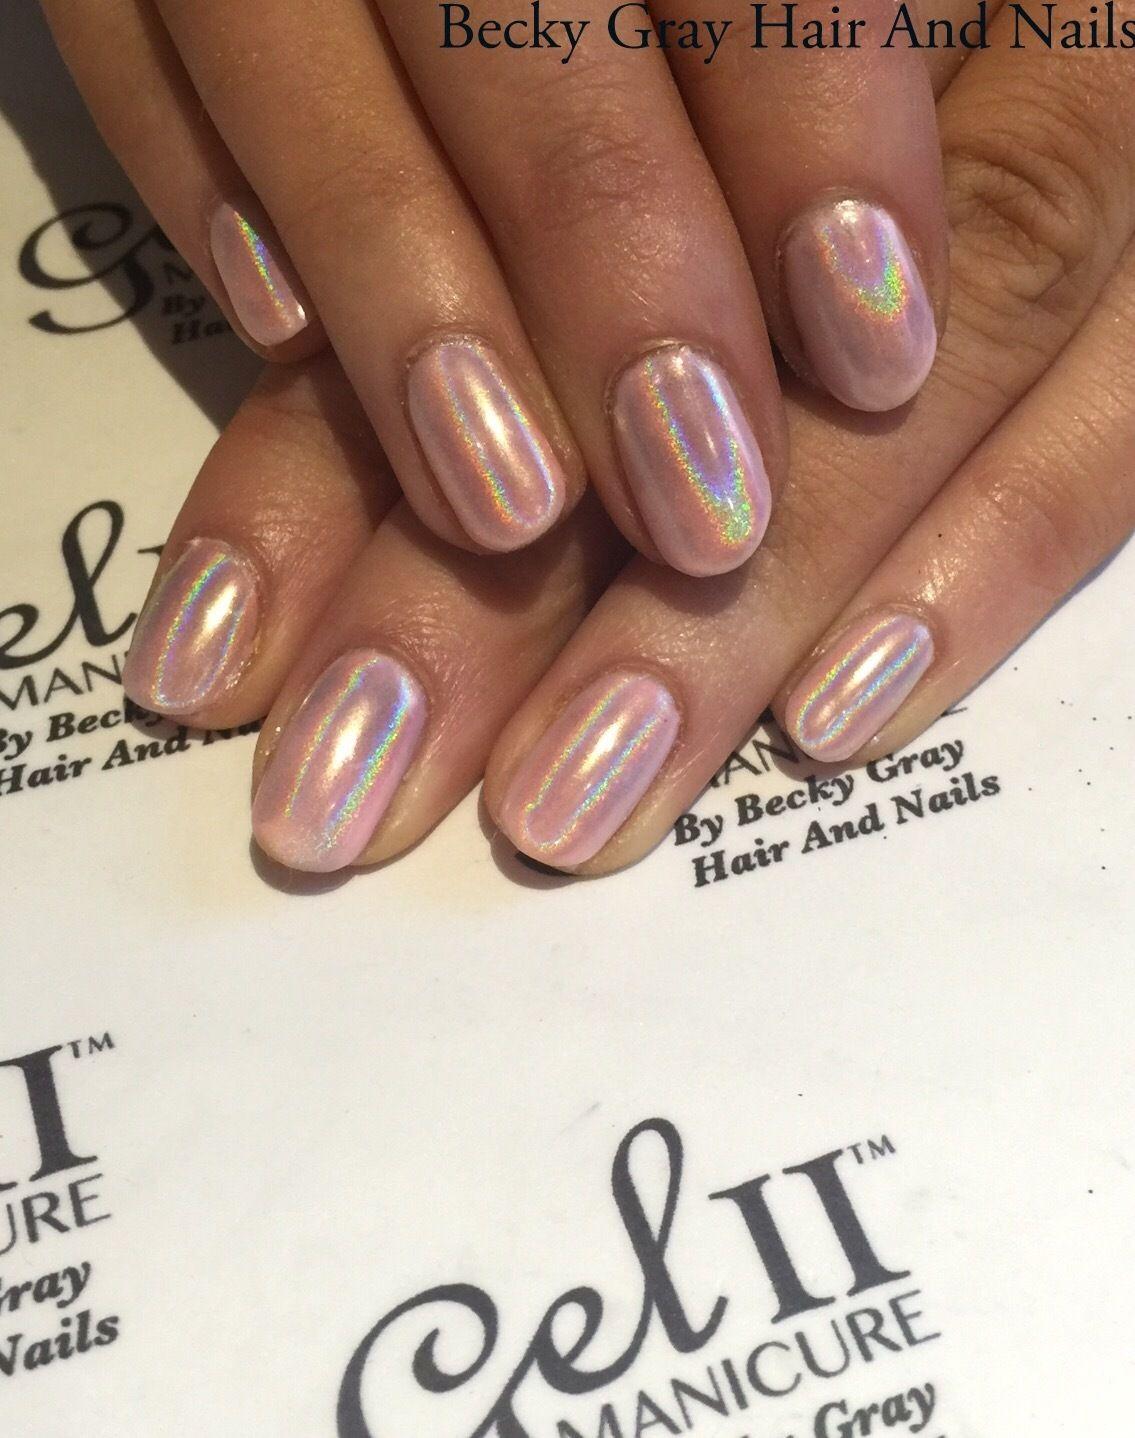 ᴾⁱⁿ: α ᵈ α . ʳ ⁱ ᵒ ˢ ✨ ☹ | nails | Pinterest | Holographic ...